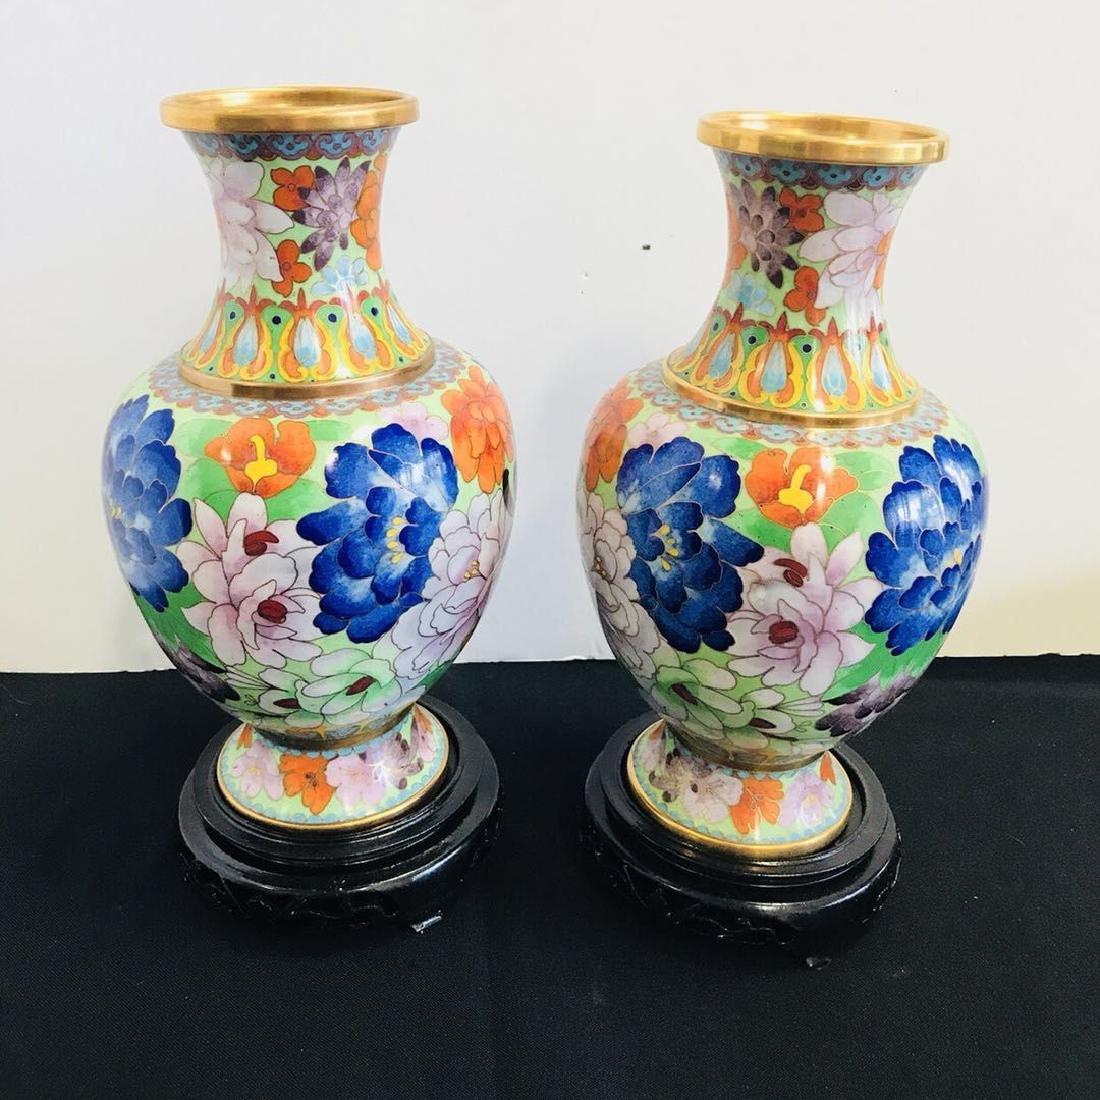 Pair of Cloisonne Enamel Porcelain Vase